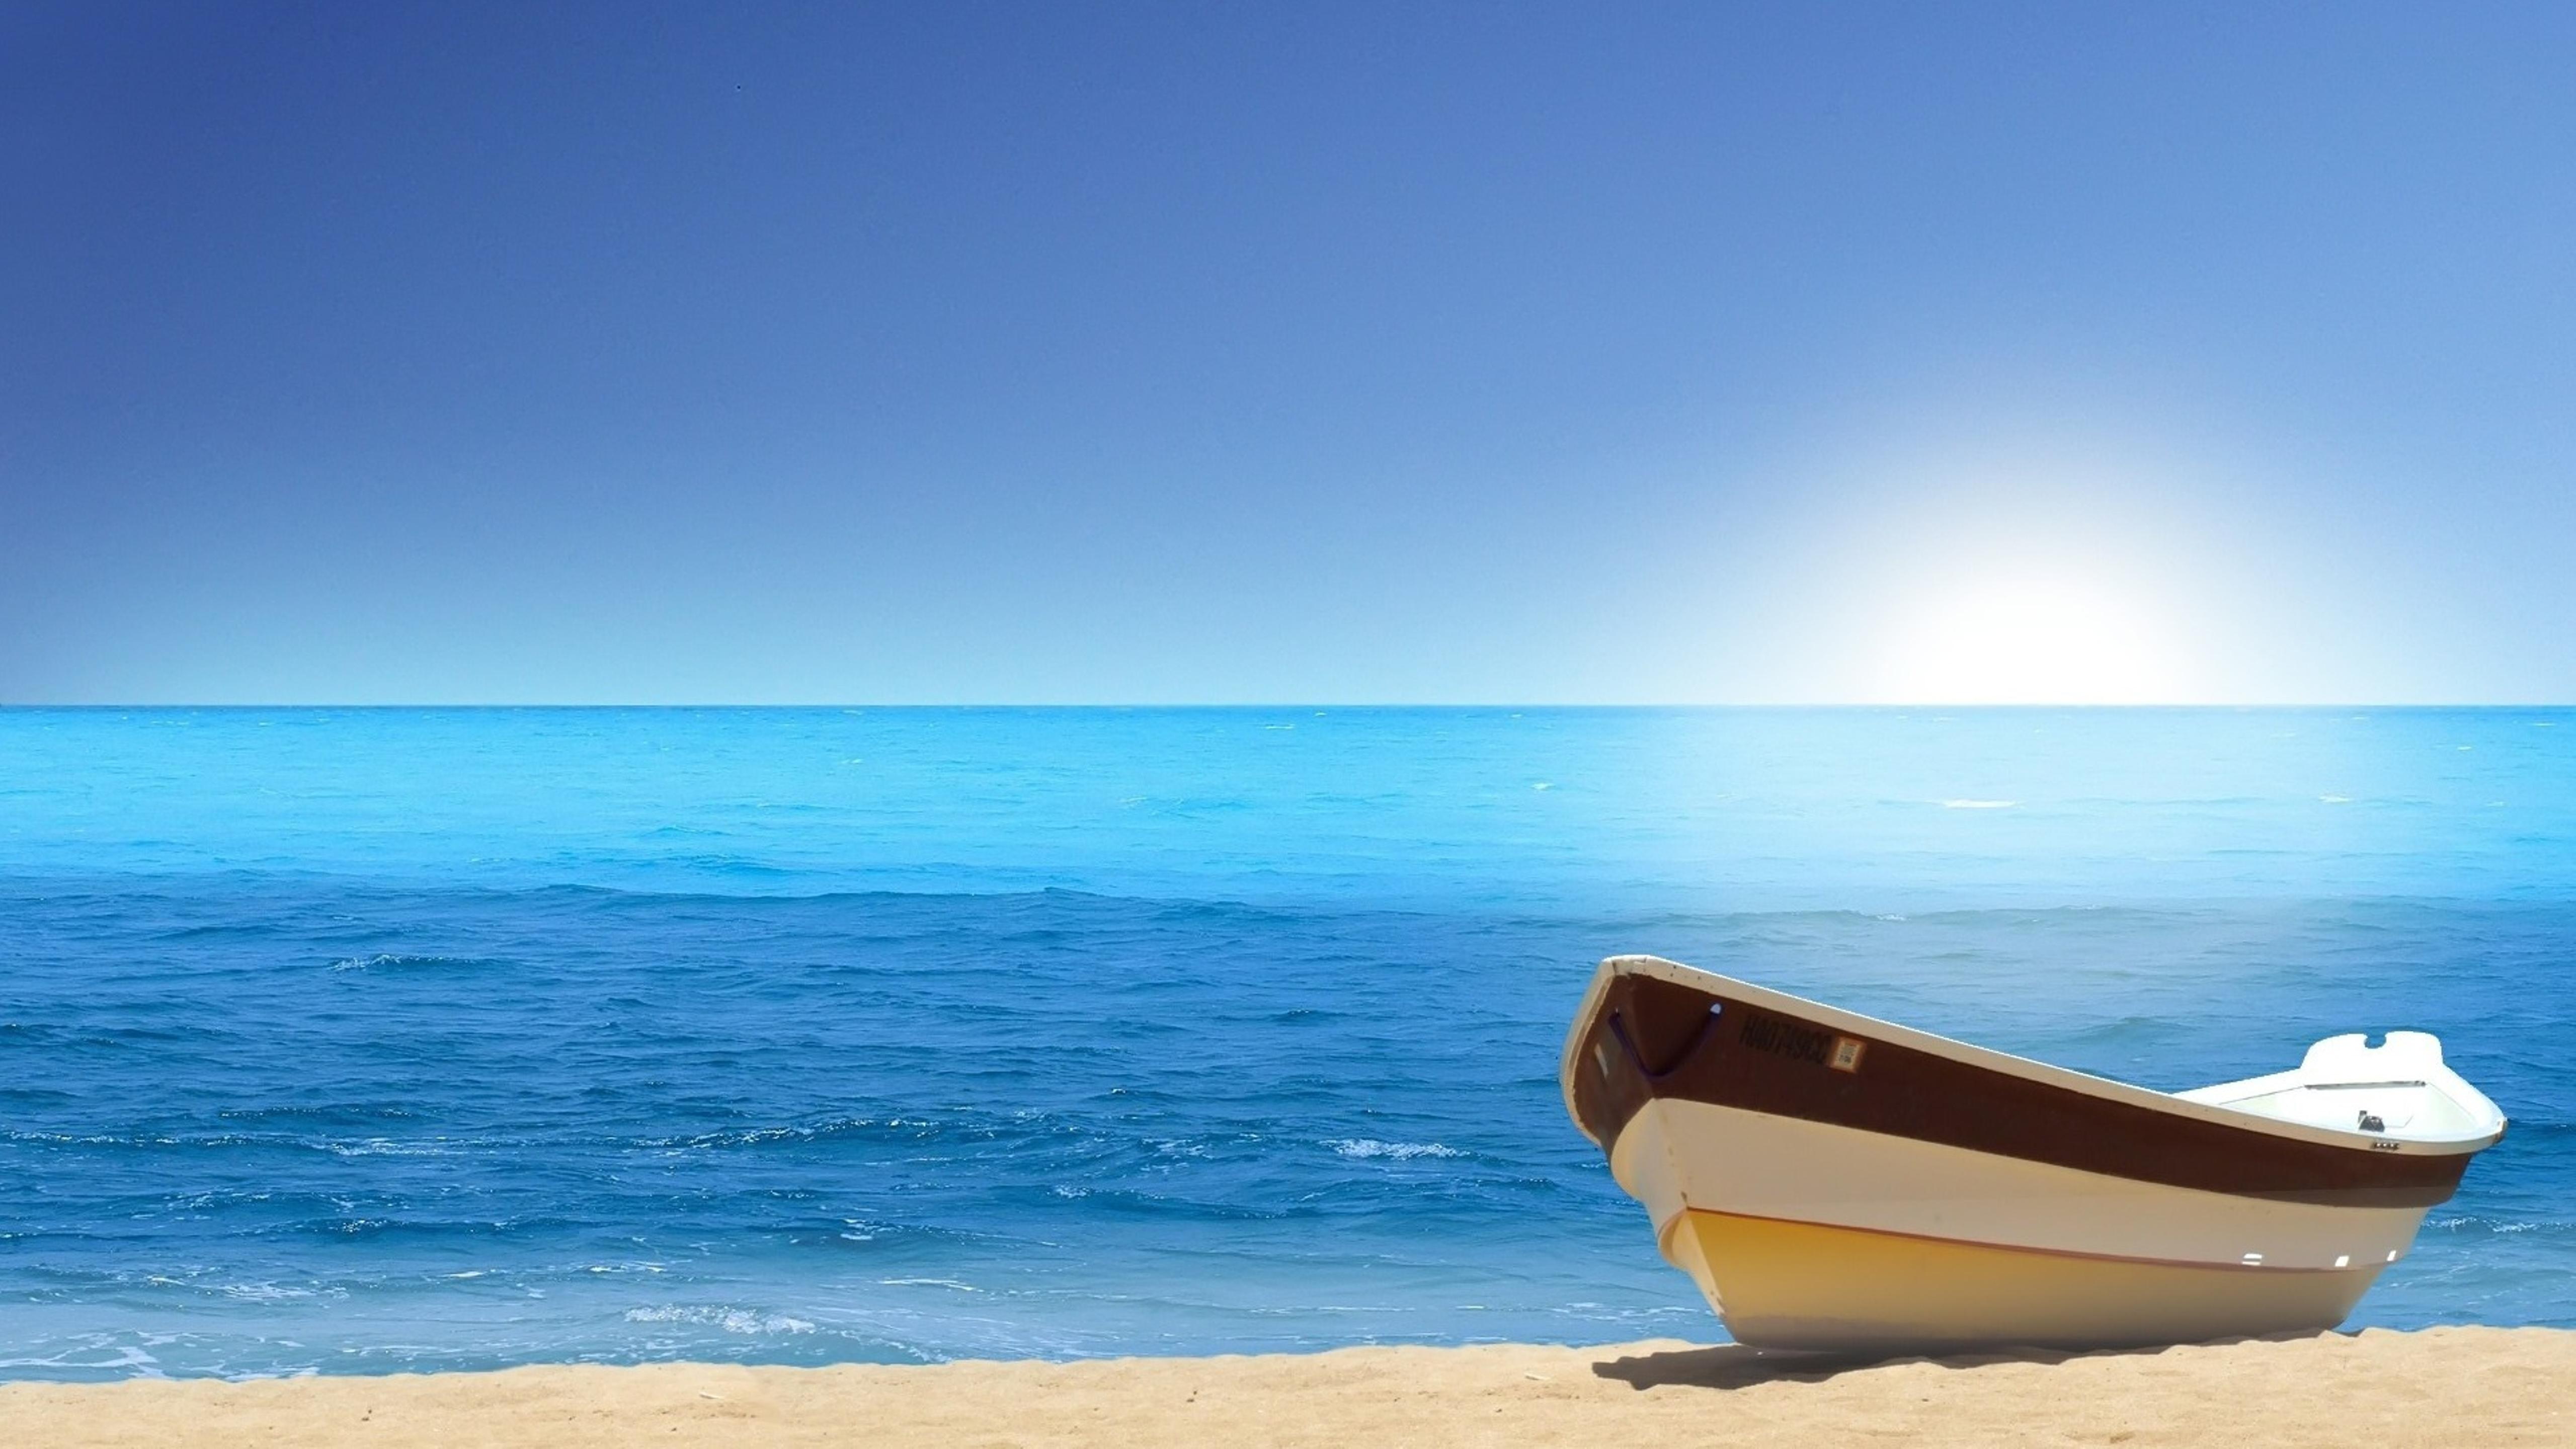 holiday seaside